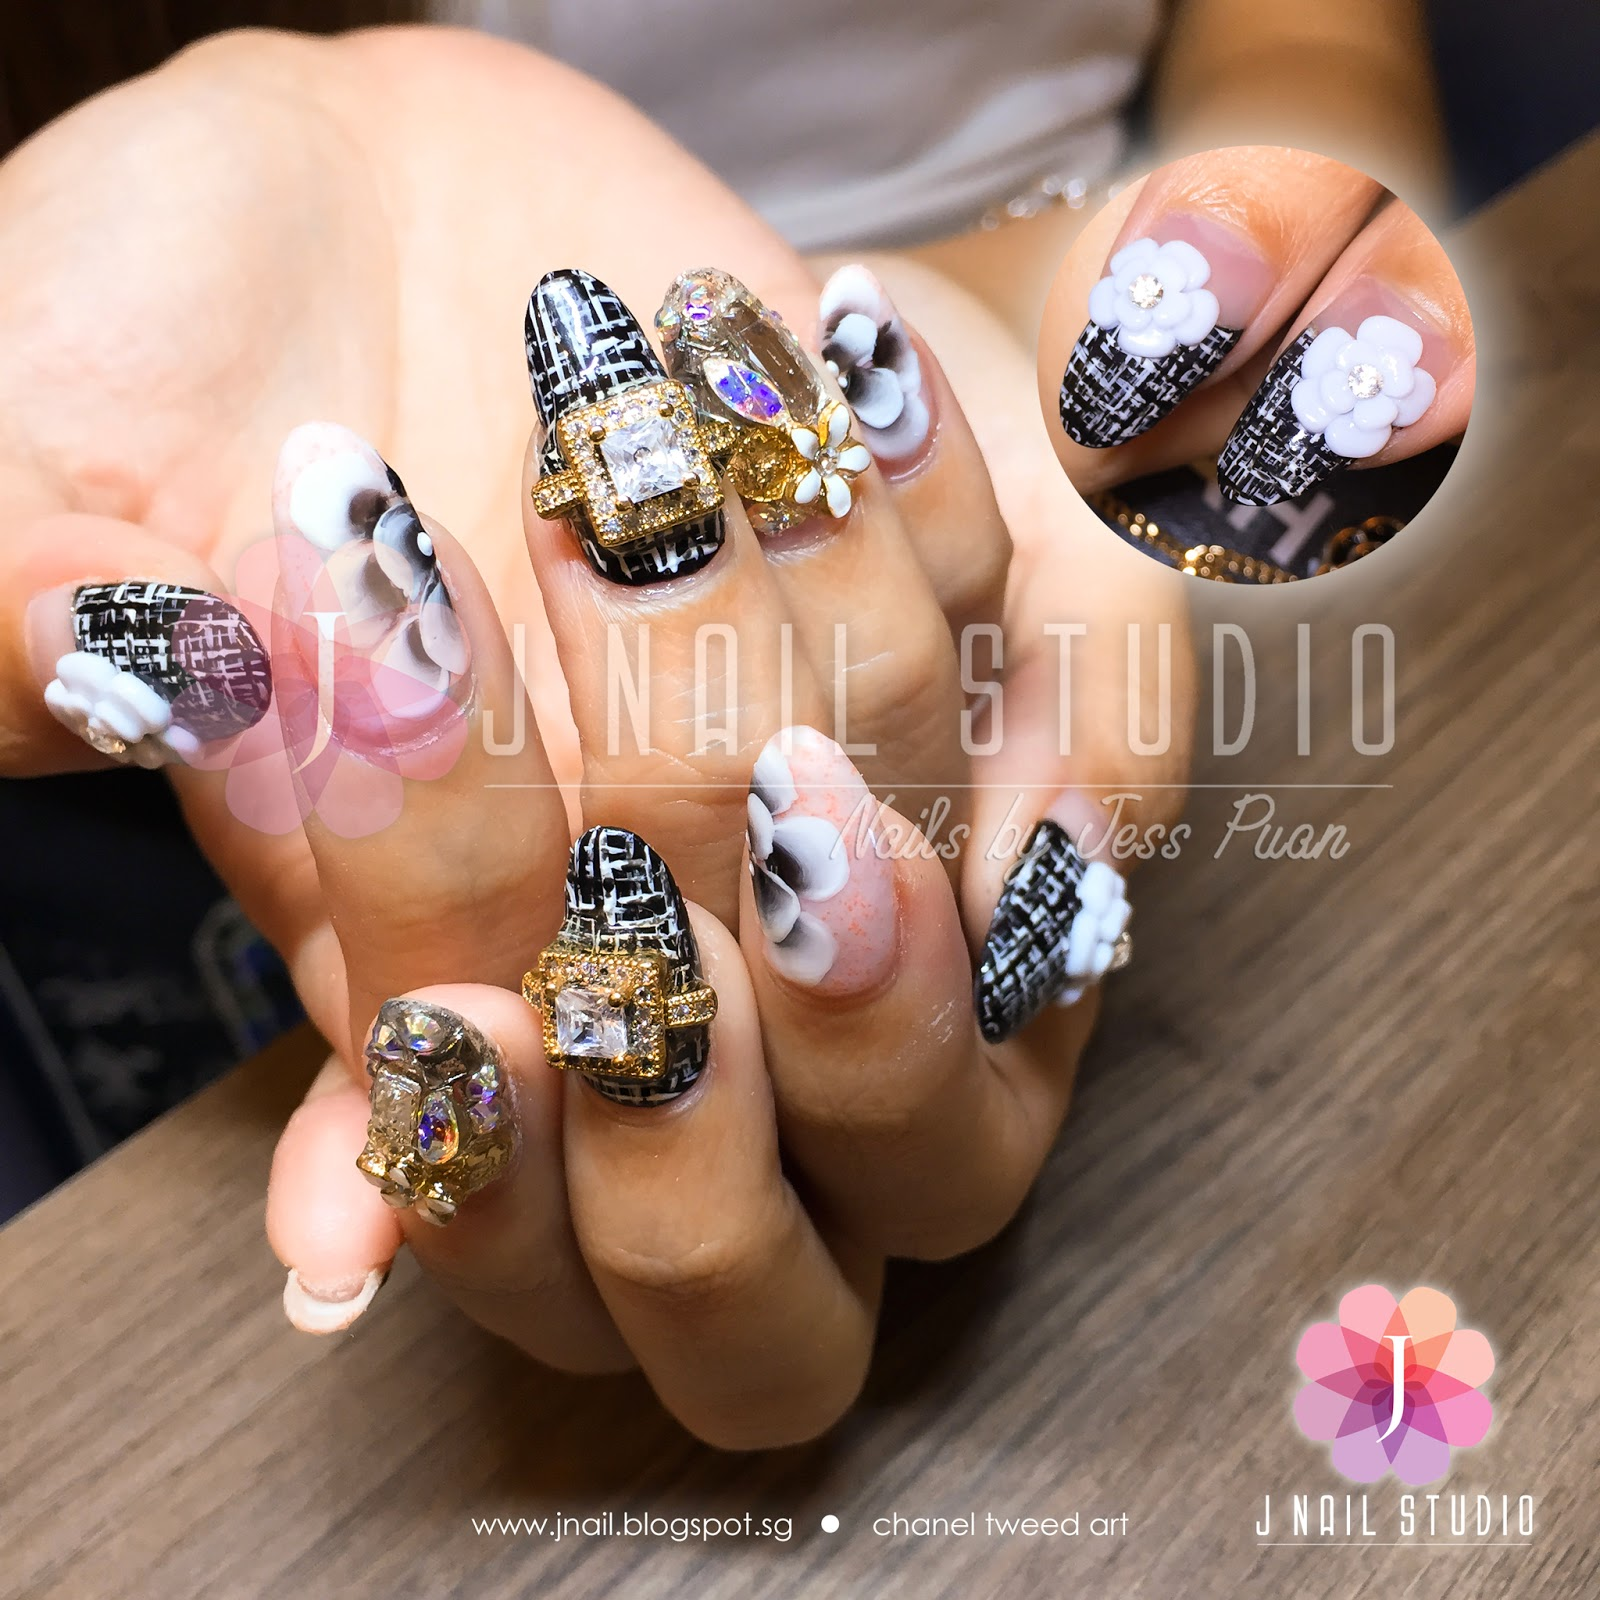 J Nail Studio Chanel Tweed Art